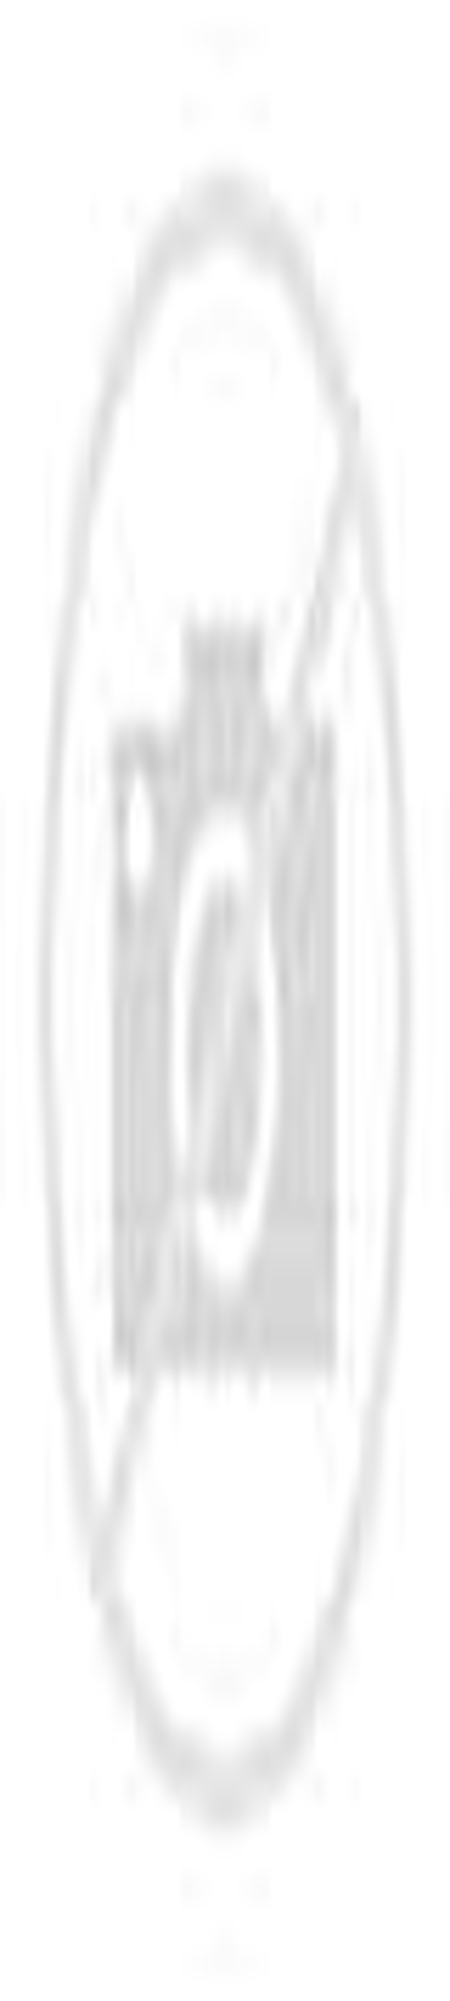 1708287 mini brochure real estate a5 21090680 freepsdvn